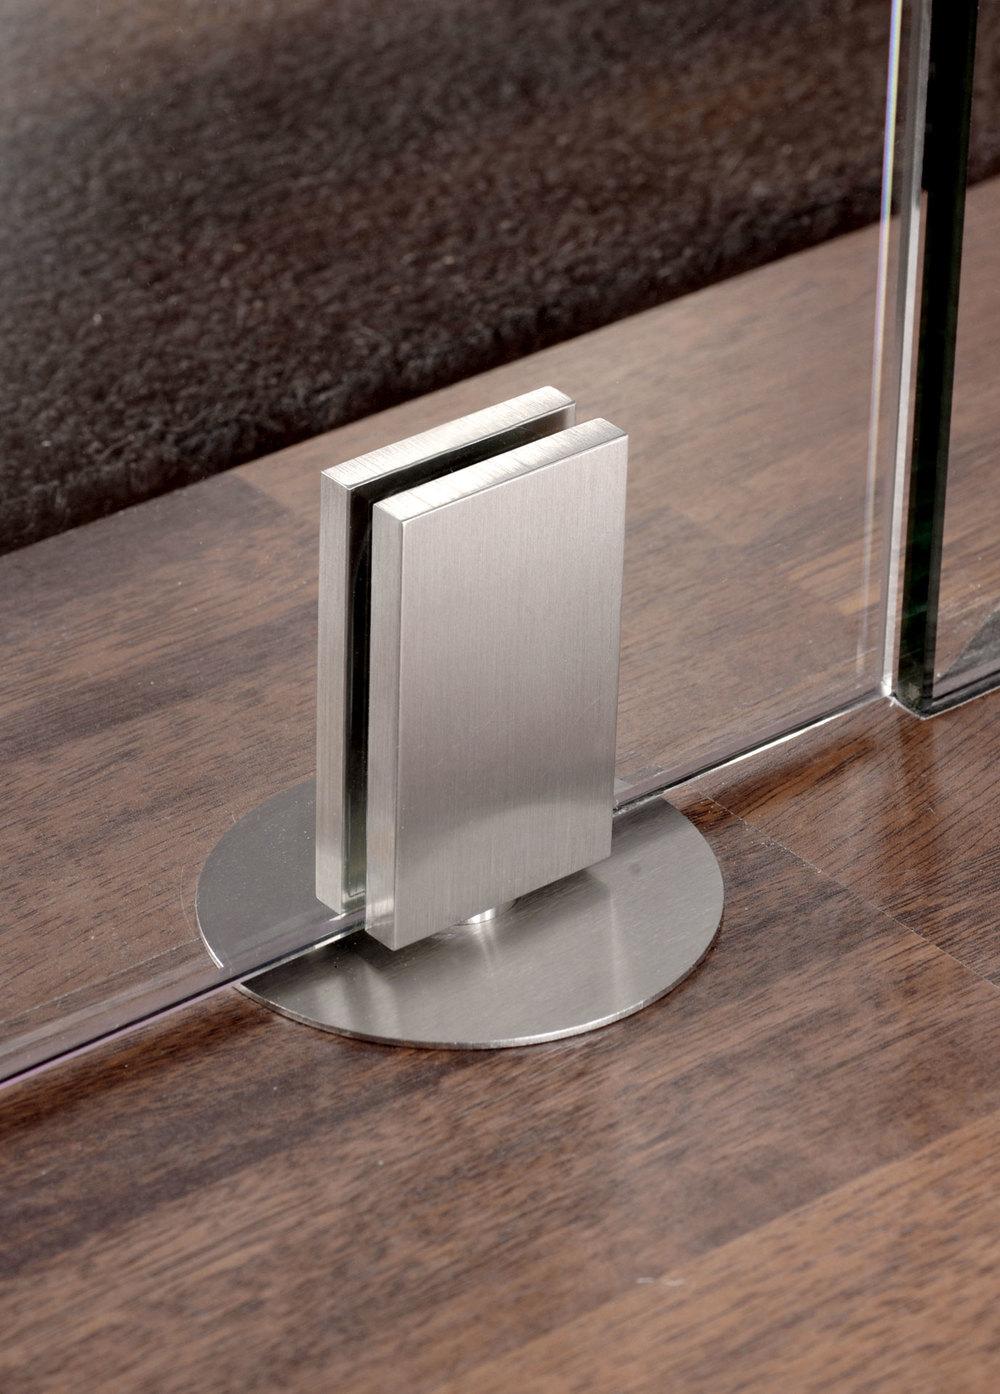 double swinging hinge swing innovation modern marcopoloflorist hardware door